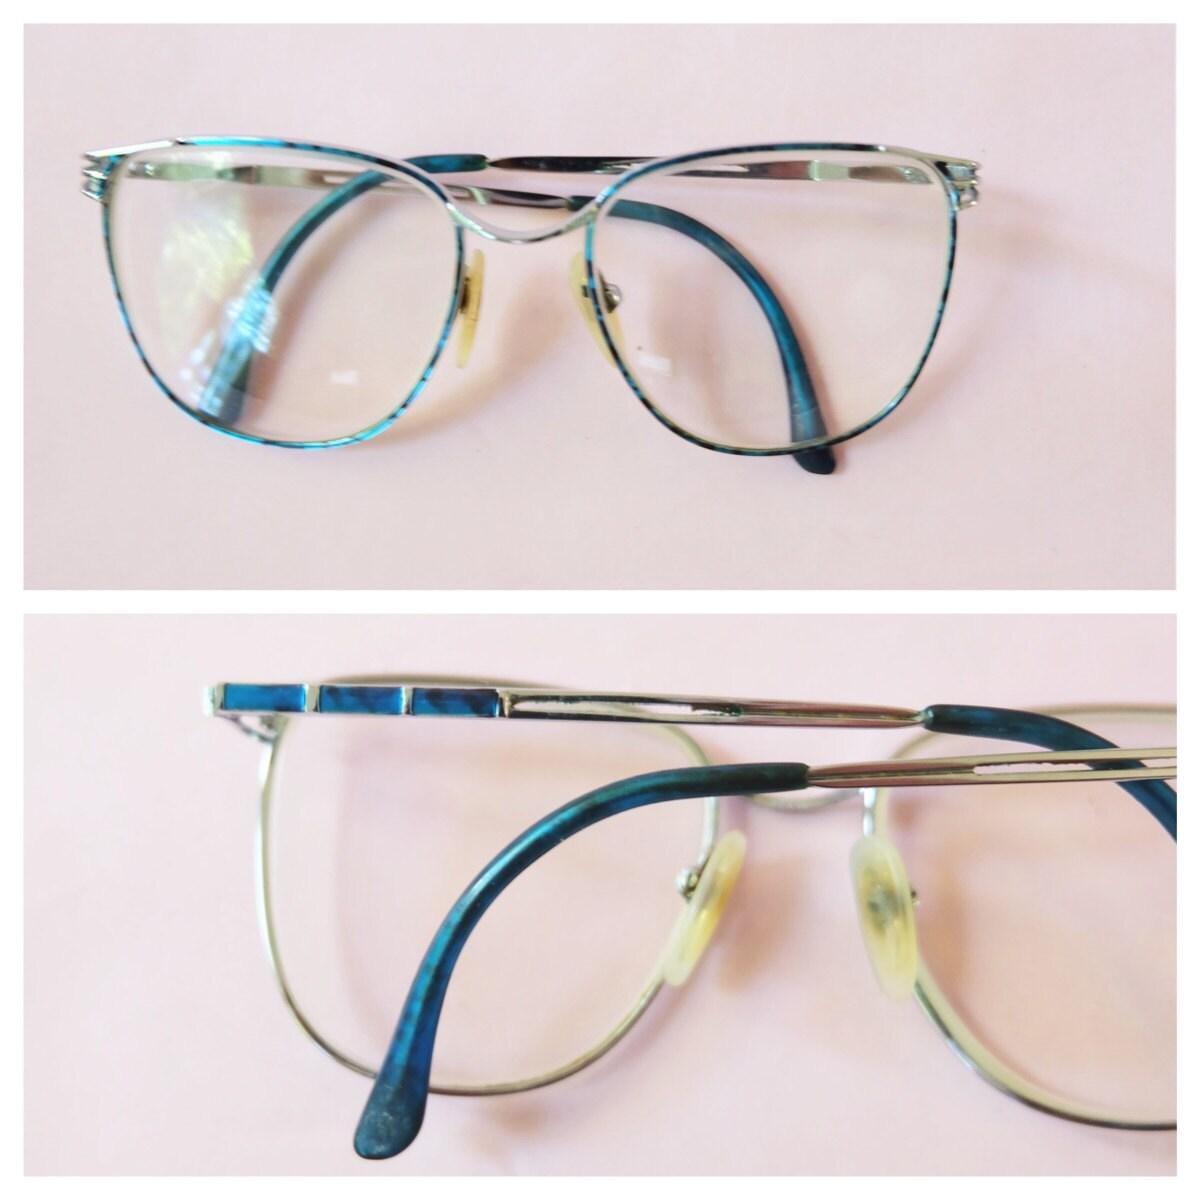 9e154adc7f1c Vintage 1970s Eyewear, Glasses, Big Glasses, Frames, Retro, Silver,  Turquoise